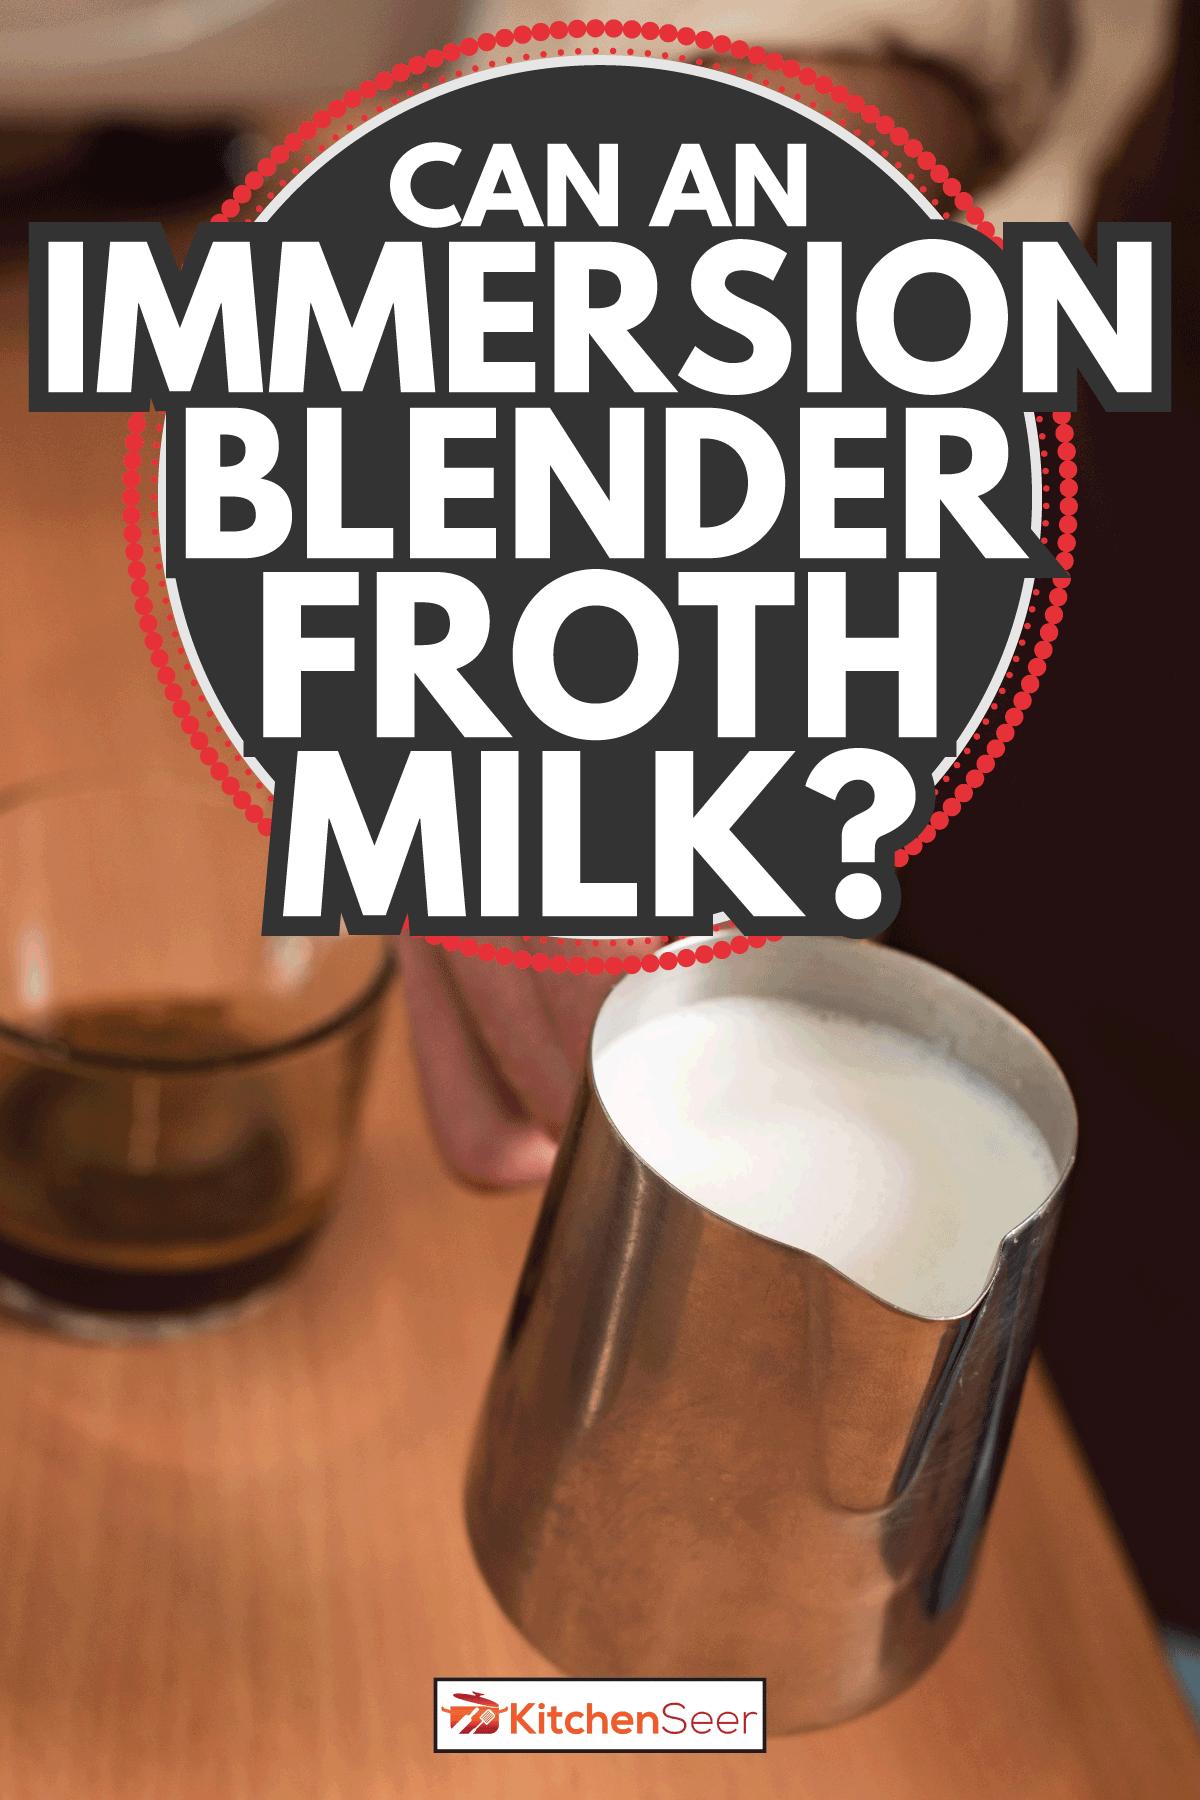 barista holding steel milk jug. Can An Immersion Blender Froth Milk